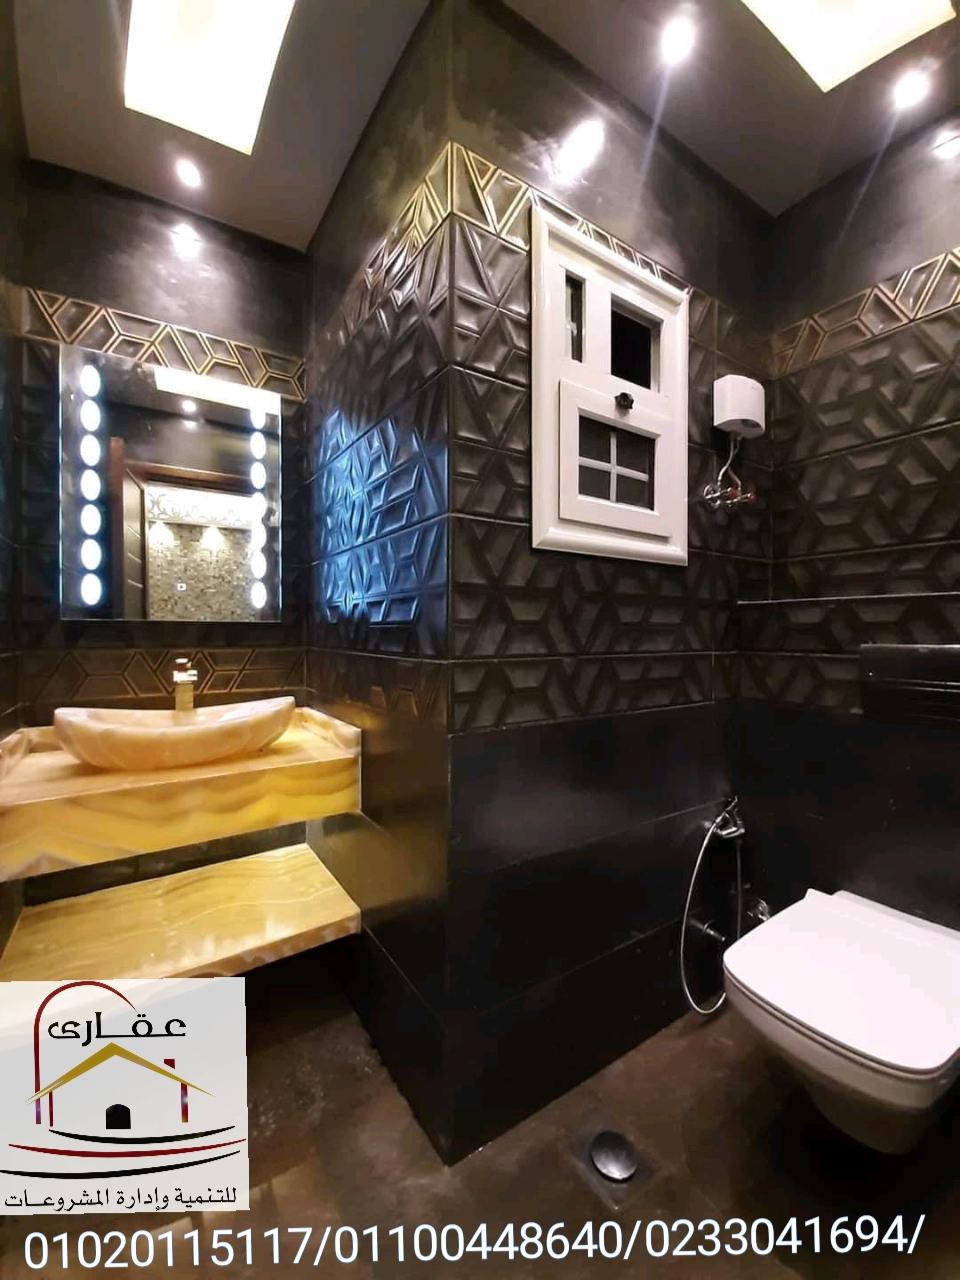 ديكورات حمامات صغيرة و كبيرة/ عقارى 01100448640 Whats164